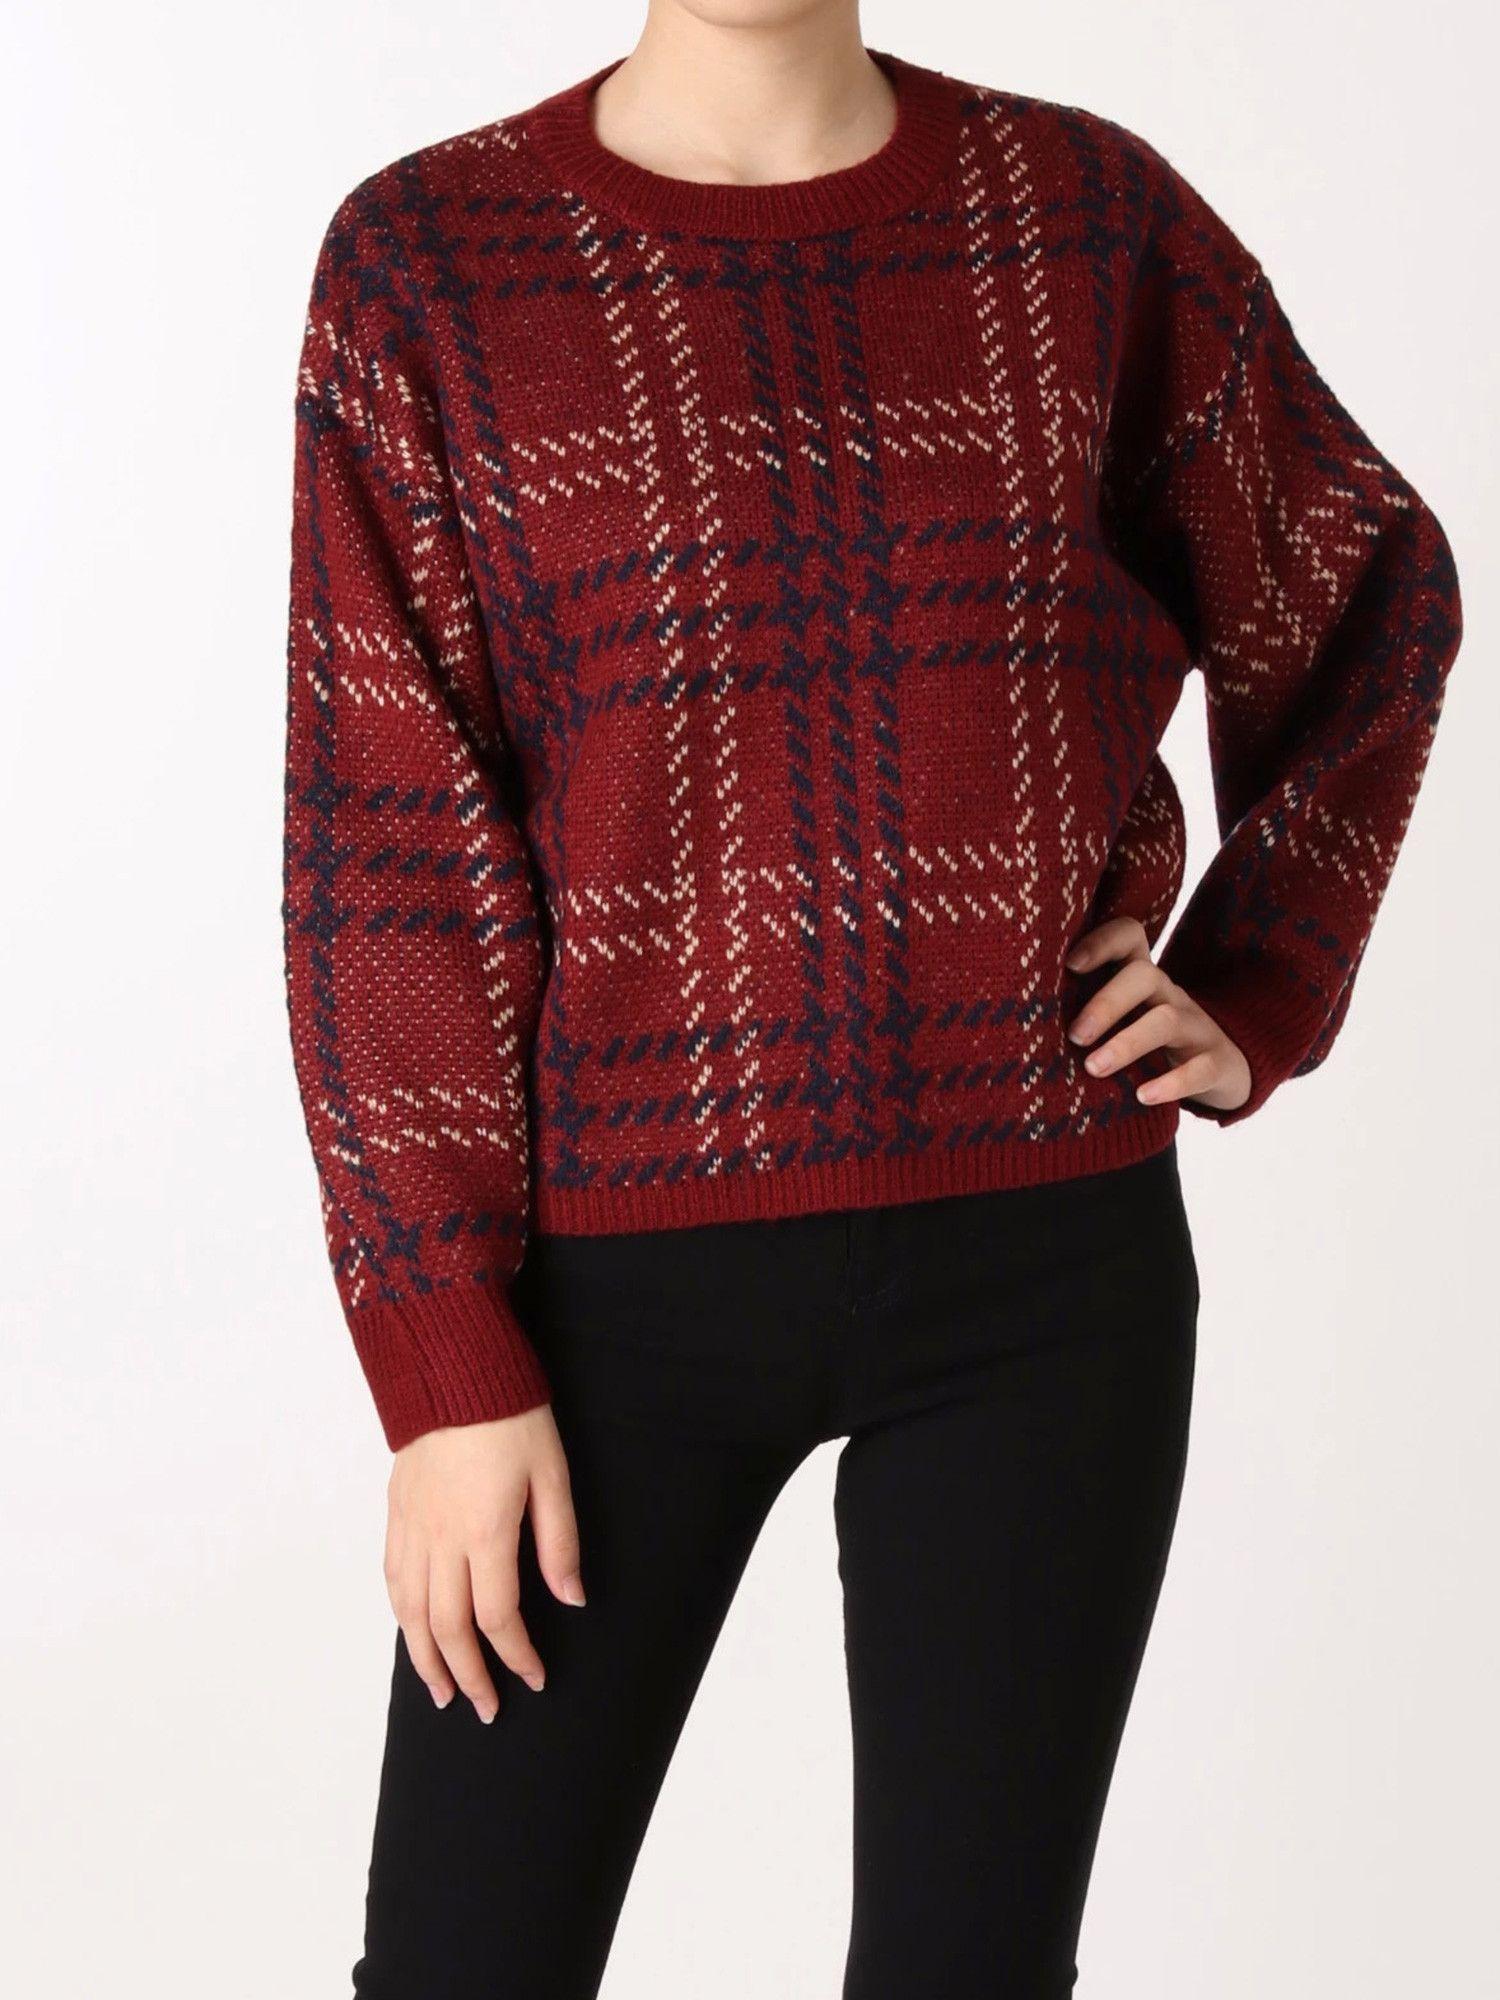 [MURUA] check jacquard knit pull-over